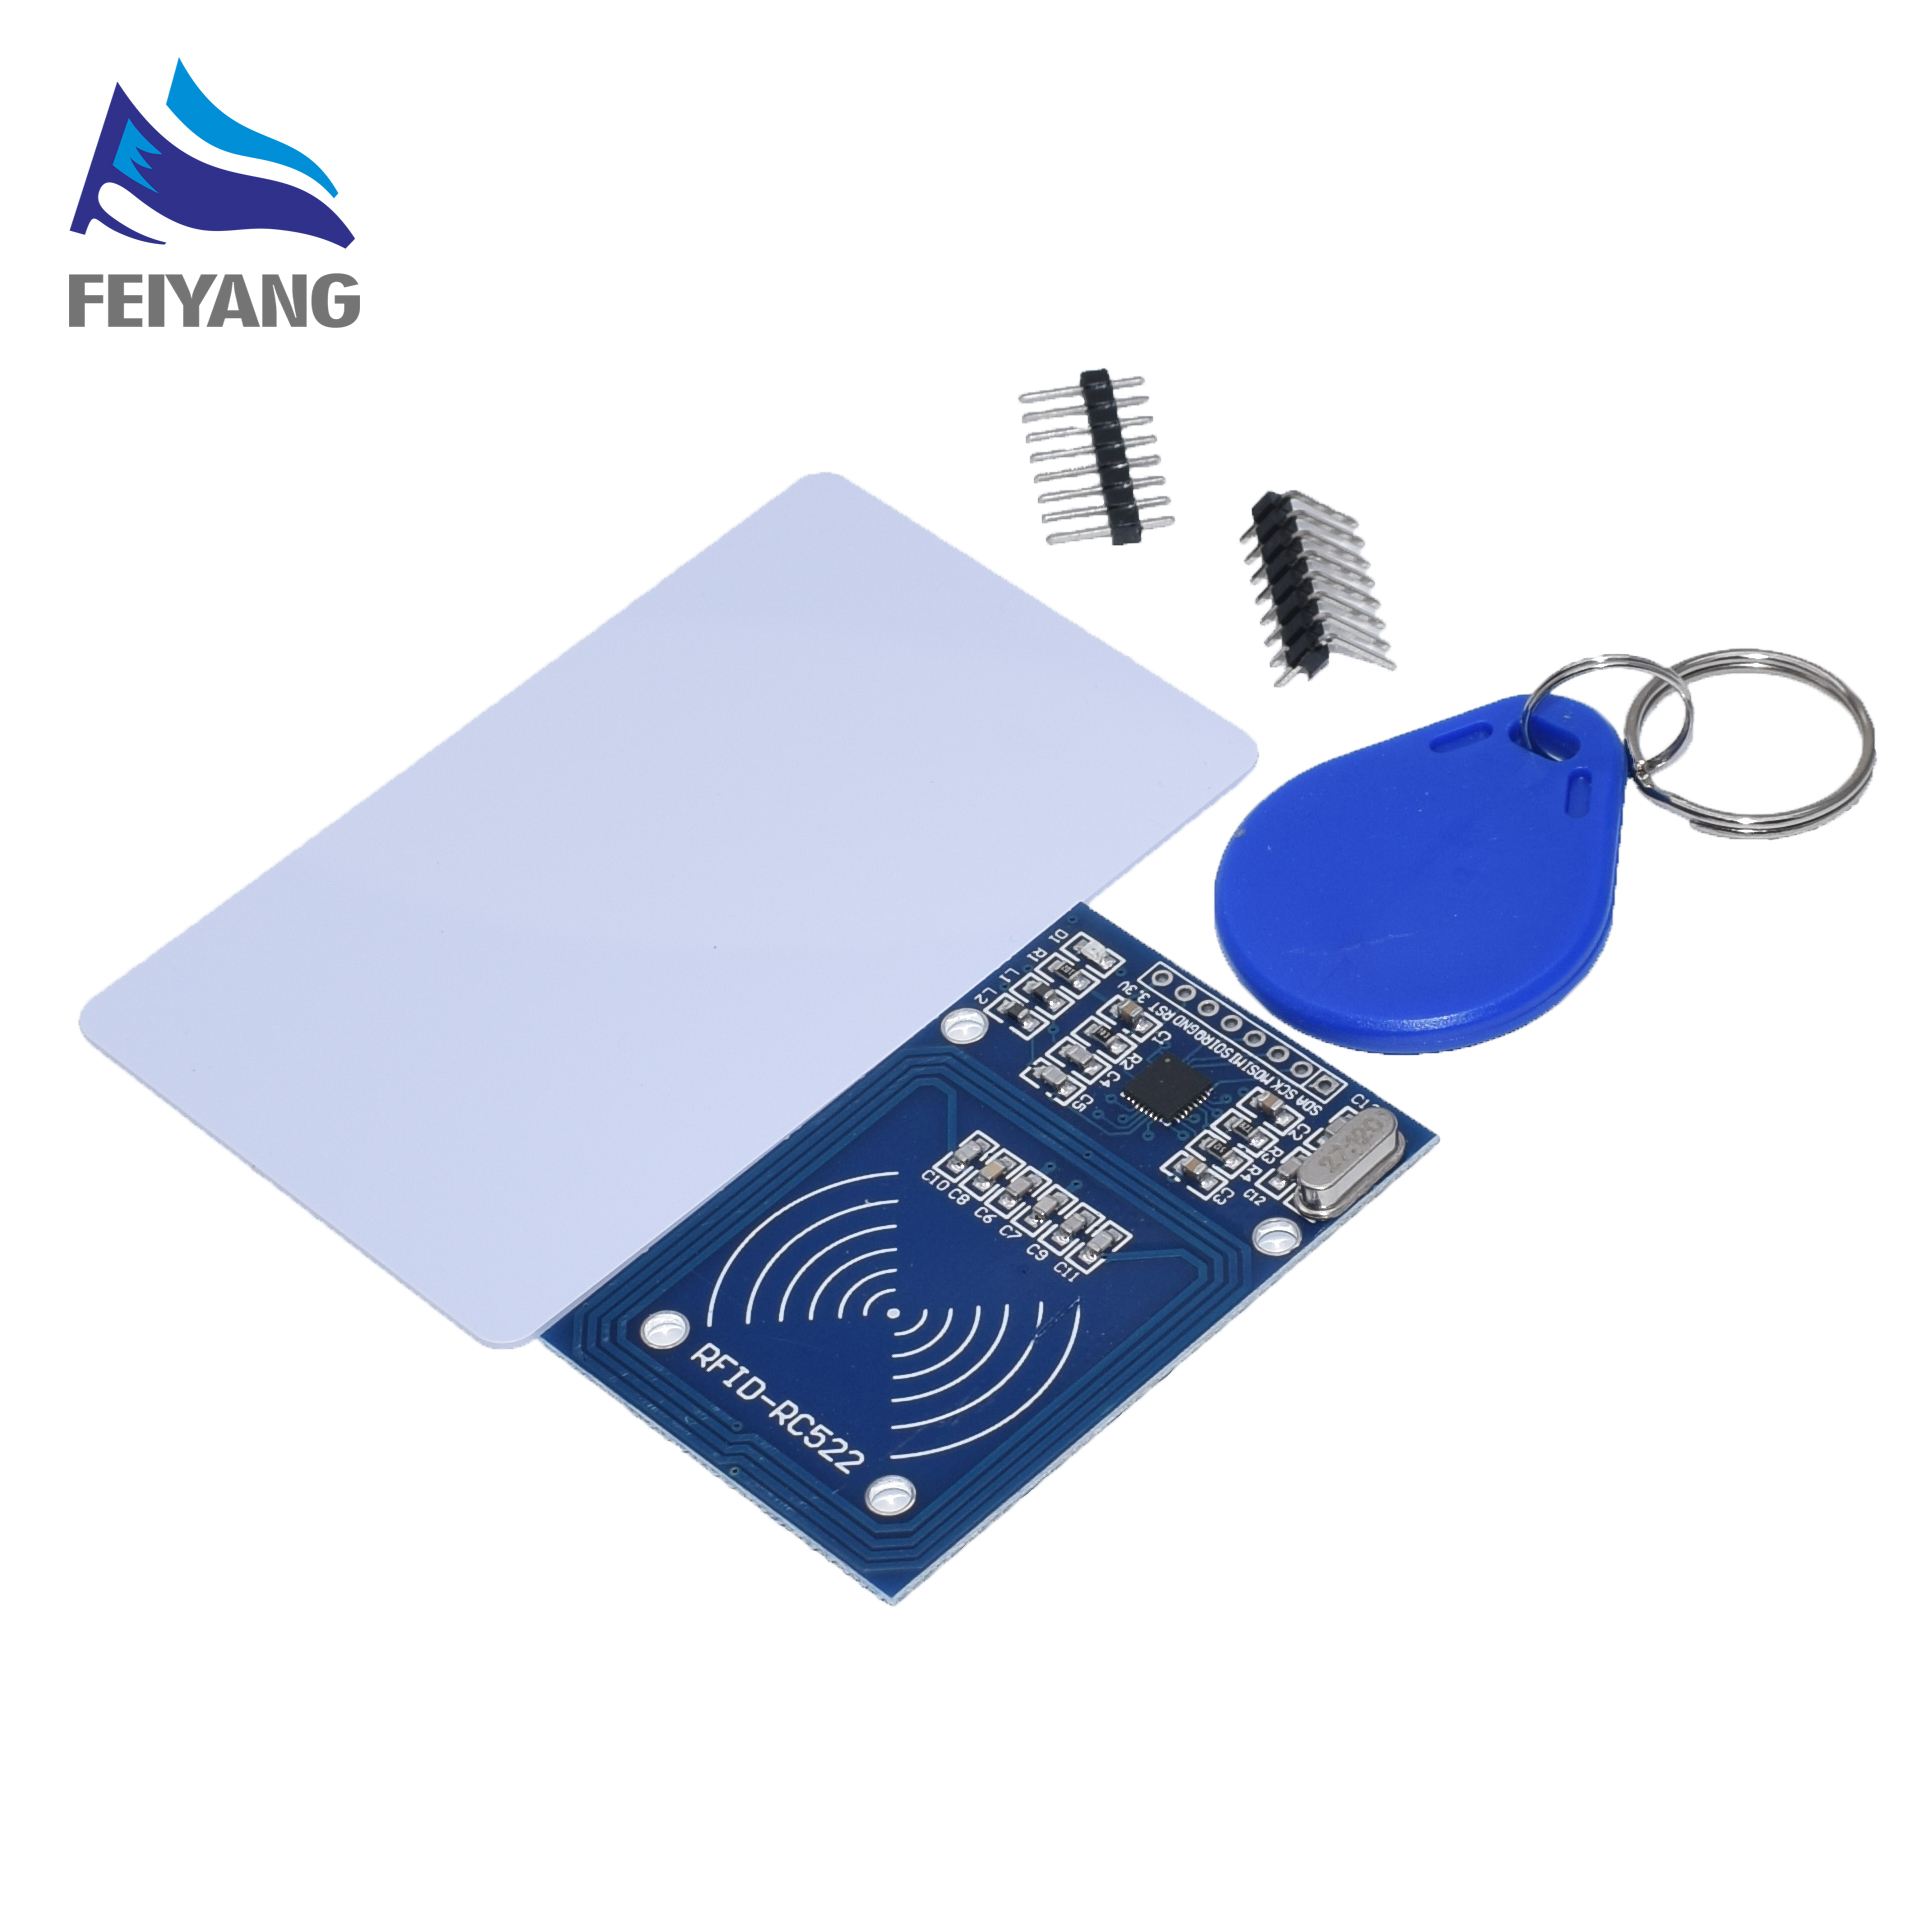 1pcs-mfrc-522-rc-522-rc522-antenna-rfid-ic-wireless-module-for-font-b-arduino-b-font-ic-key-spi-writer-reader-ic-card-proximity-module